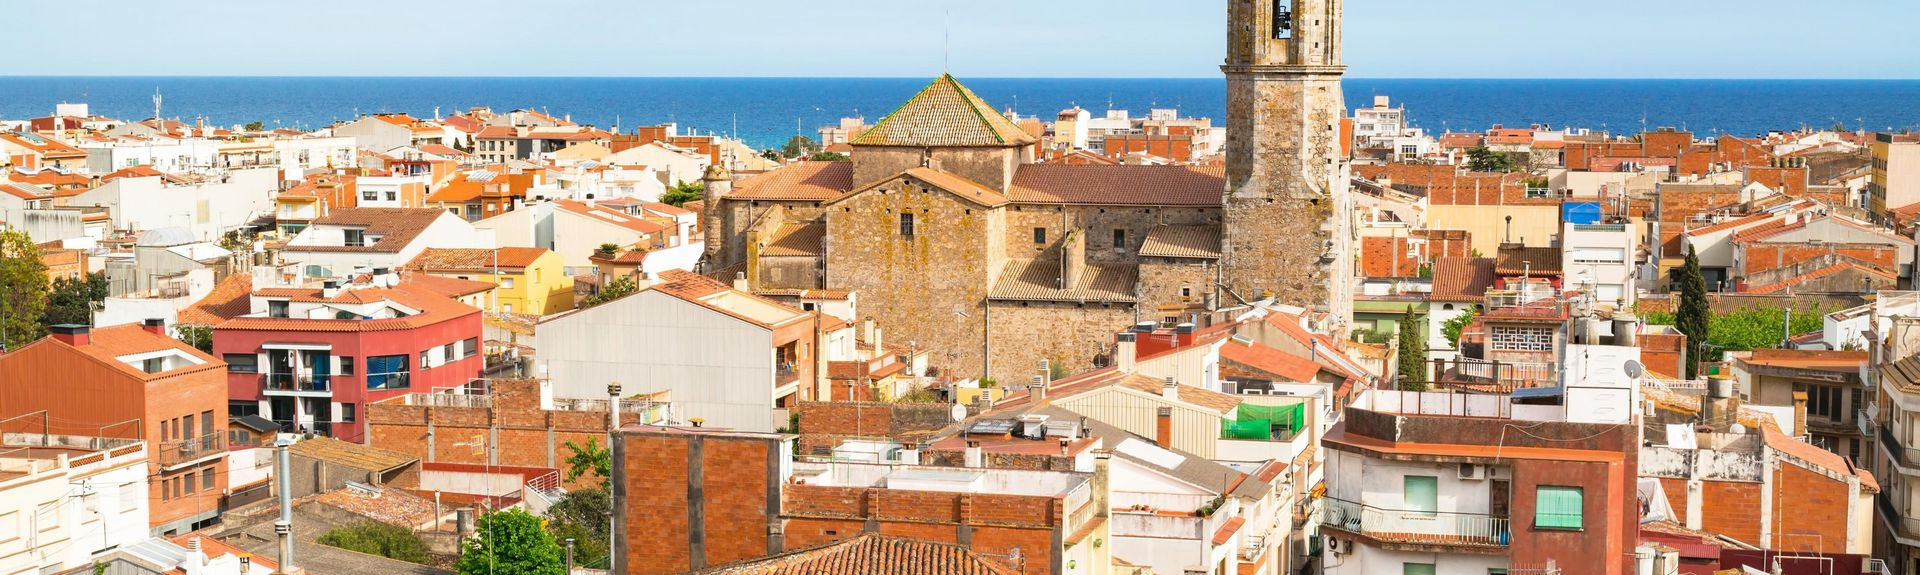 Malgrat de Mar, Catalogne, Espagne